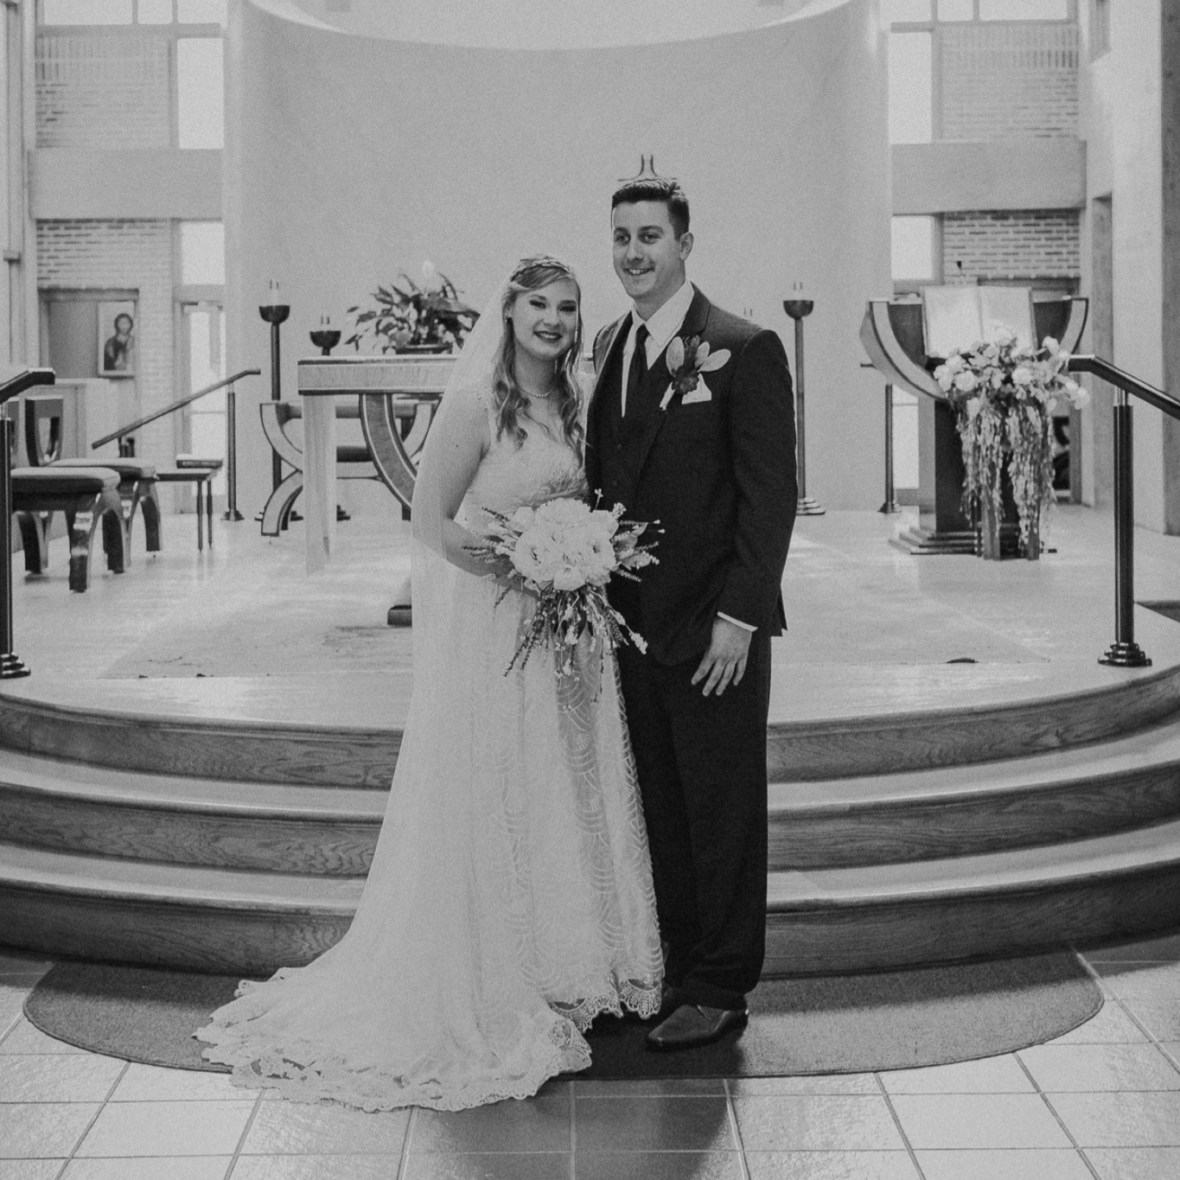 40_WCTM4235abwb_Louisville_Reception_Club_Kentucky_Wedding_Country_Woodhaven